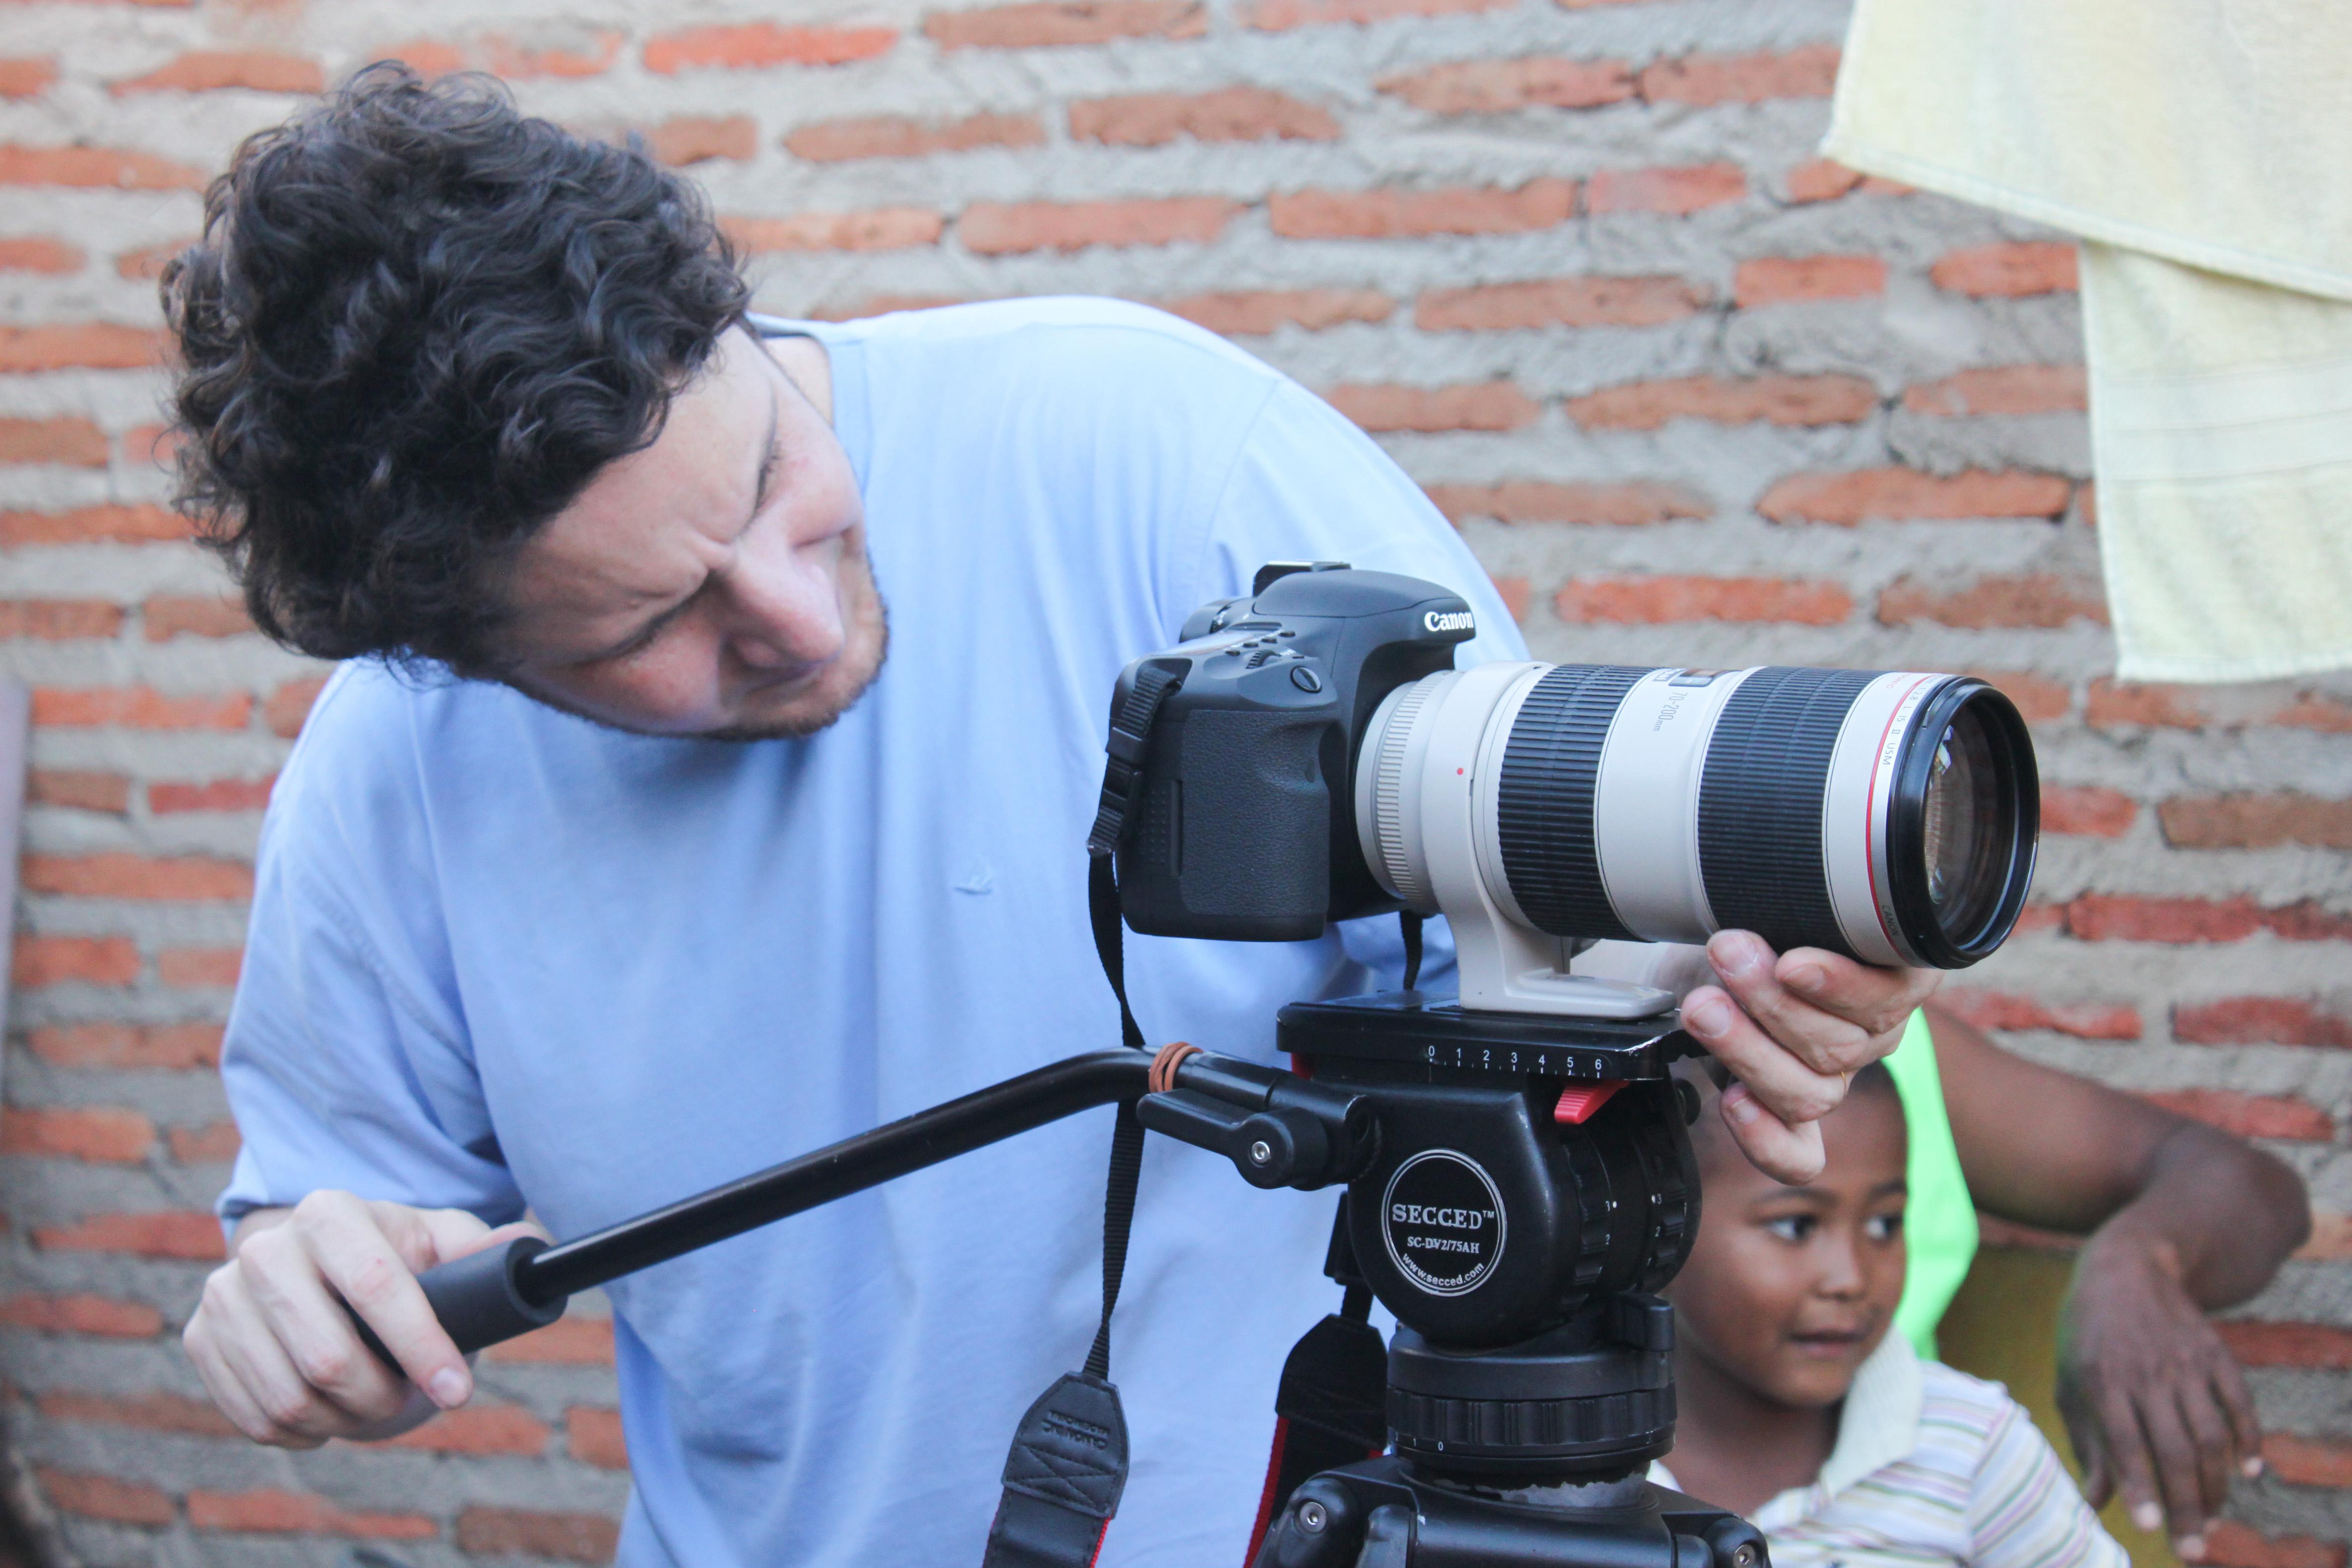 Bruno Tiezzi, diretor de fotografia